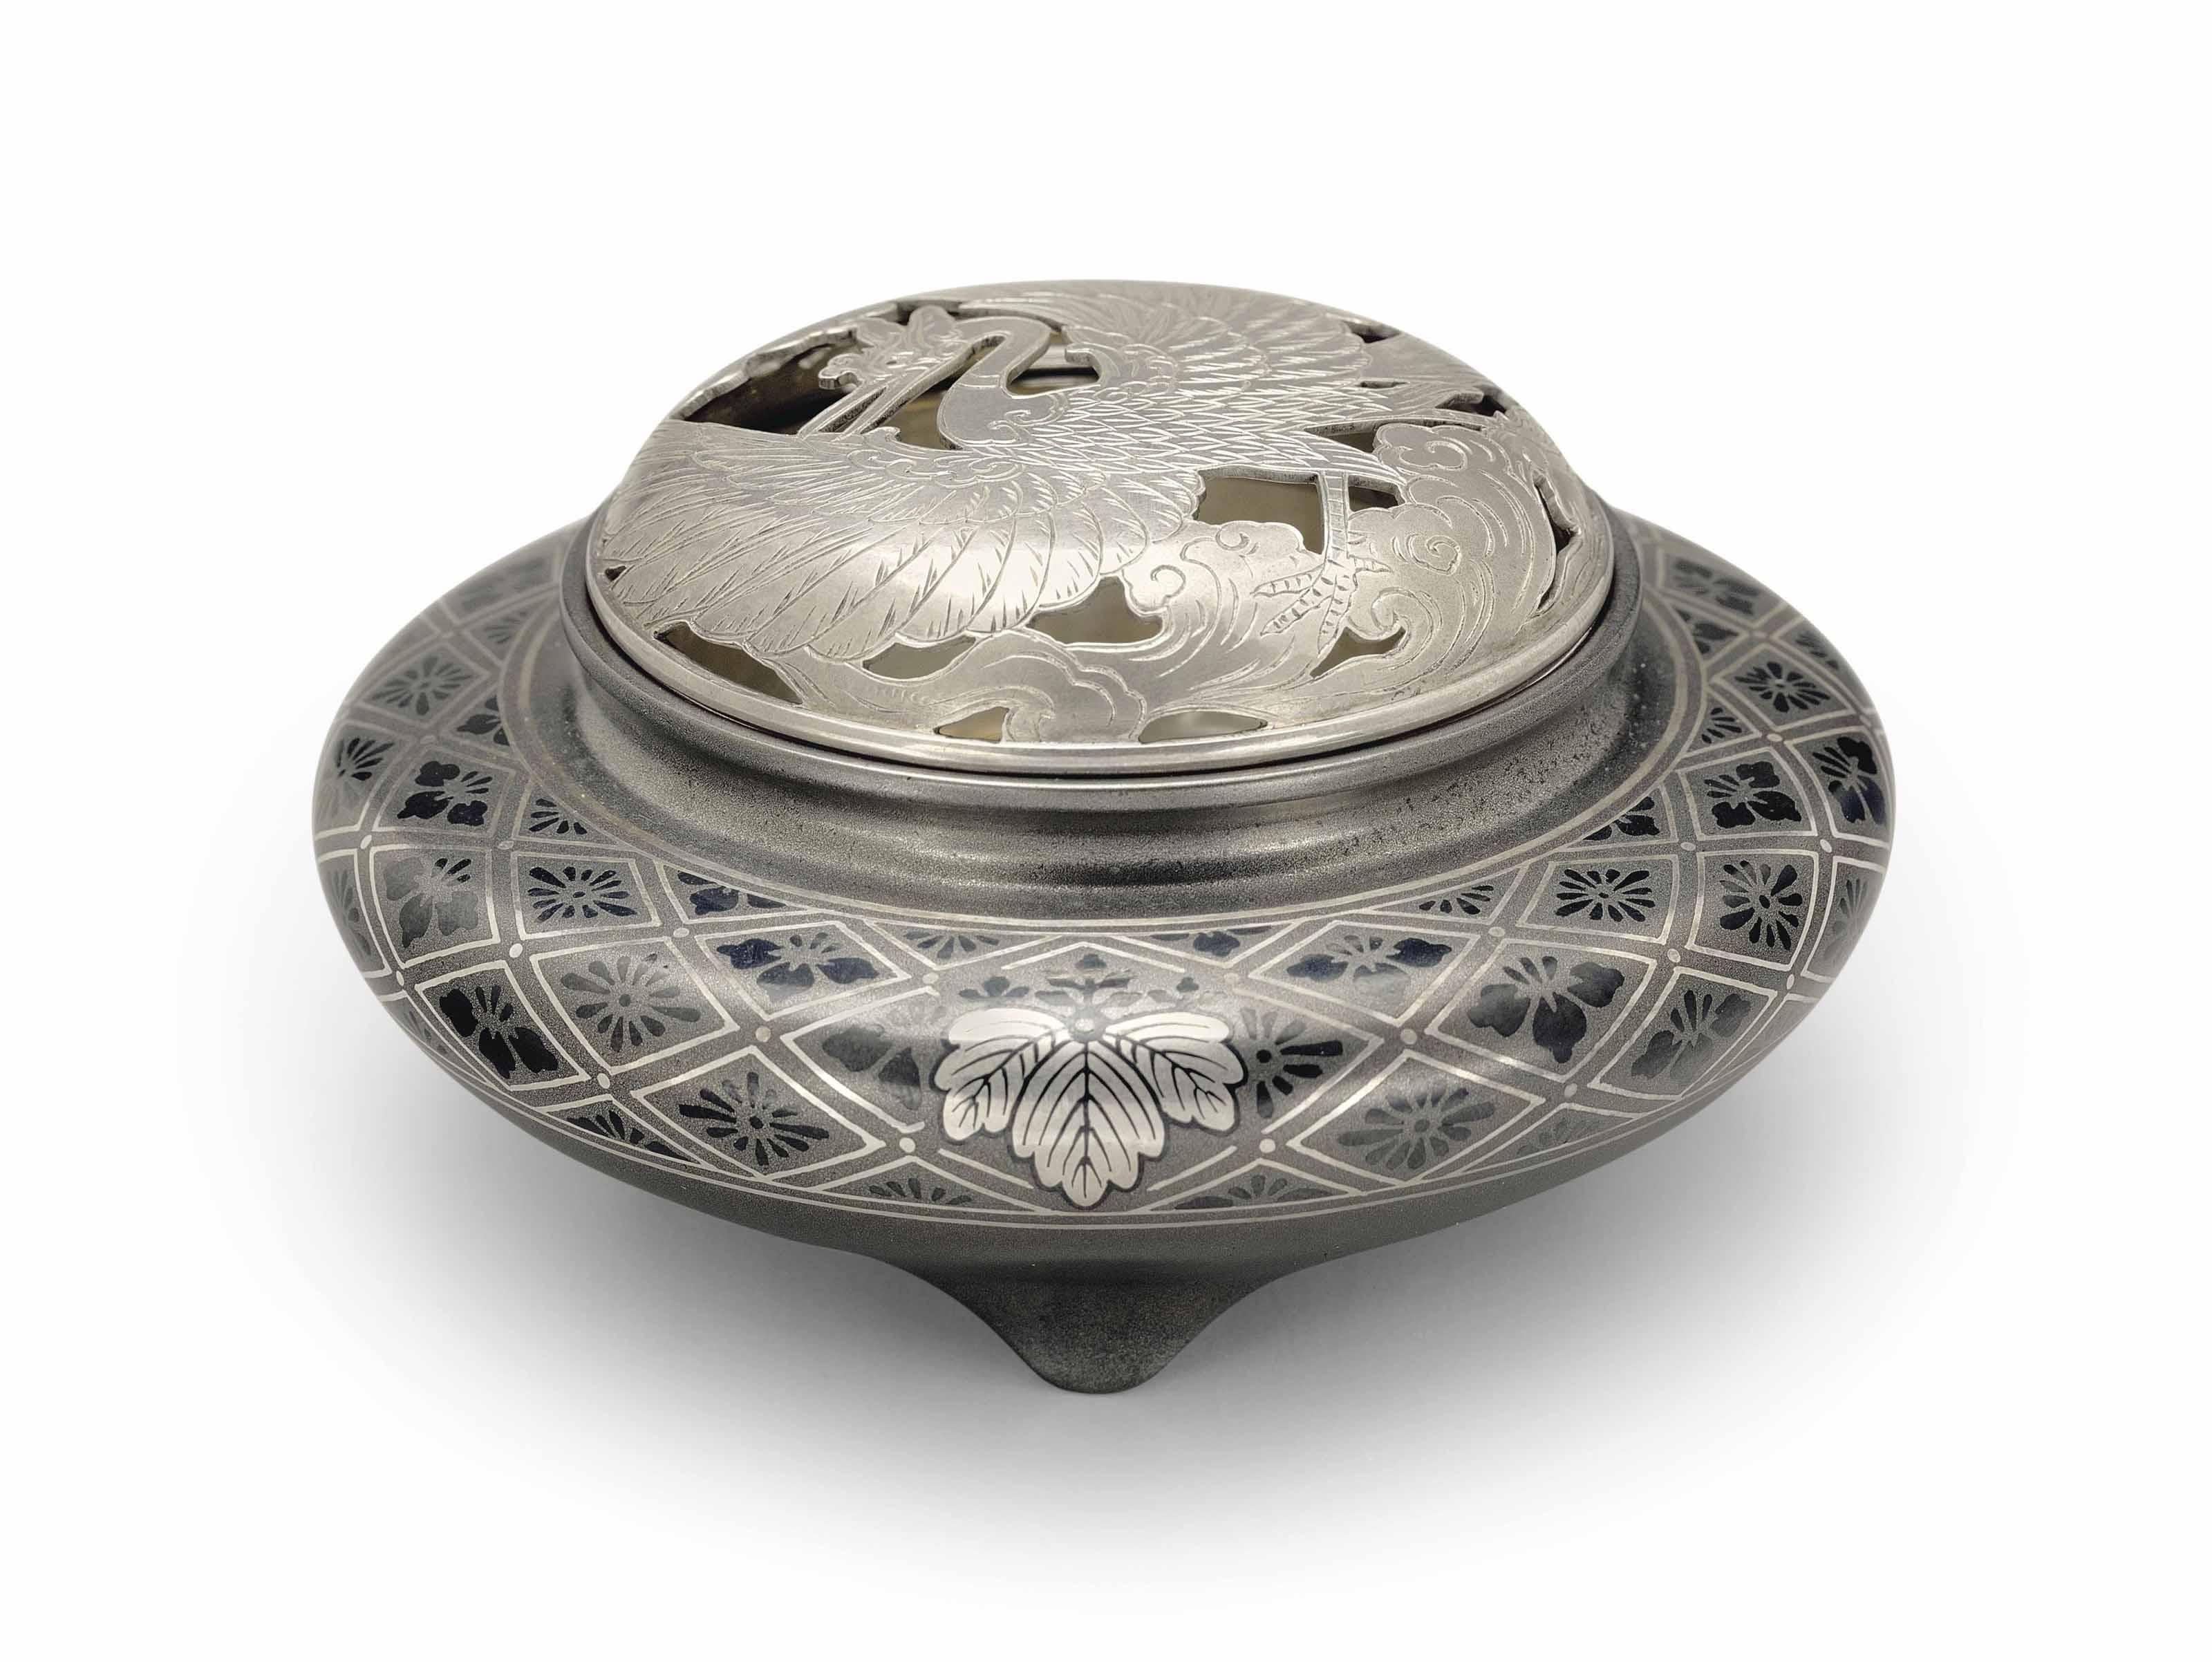 A soft-metal-inlaid bronze incense burner